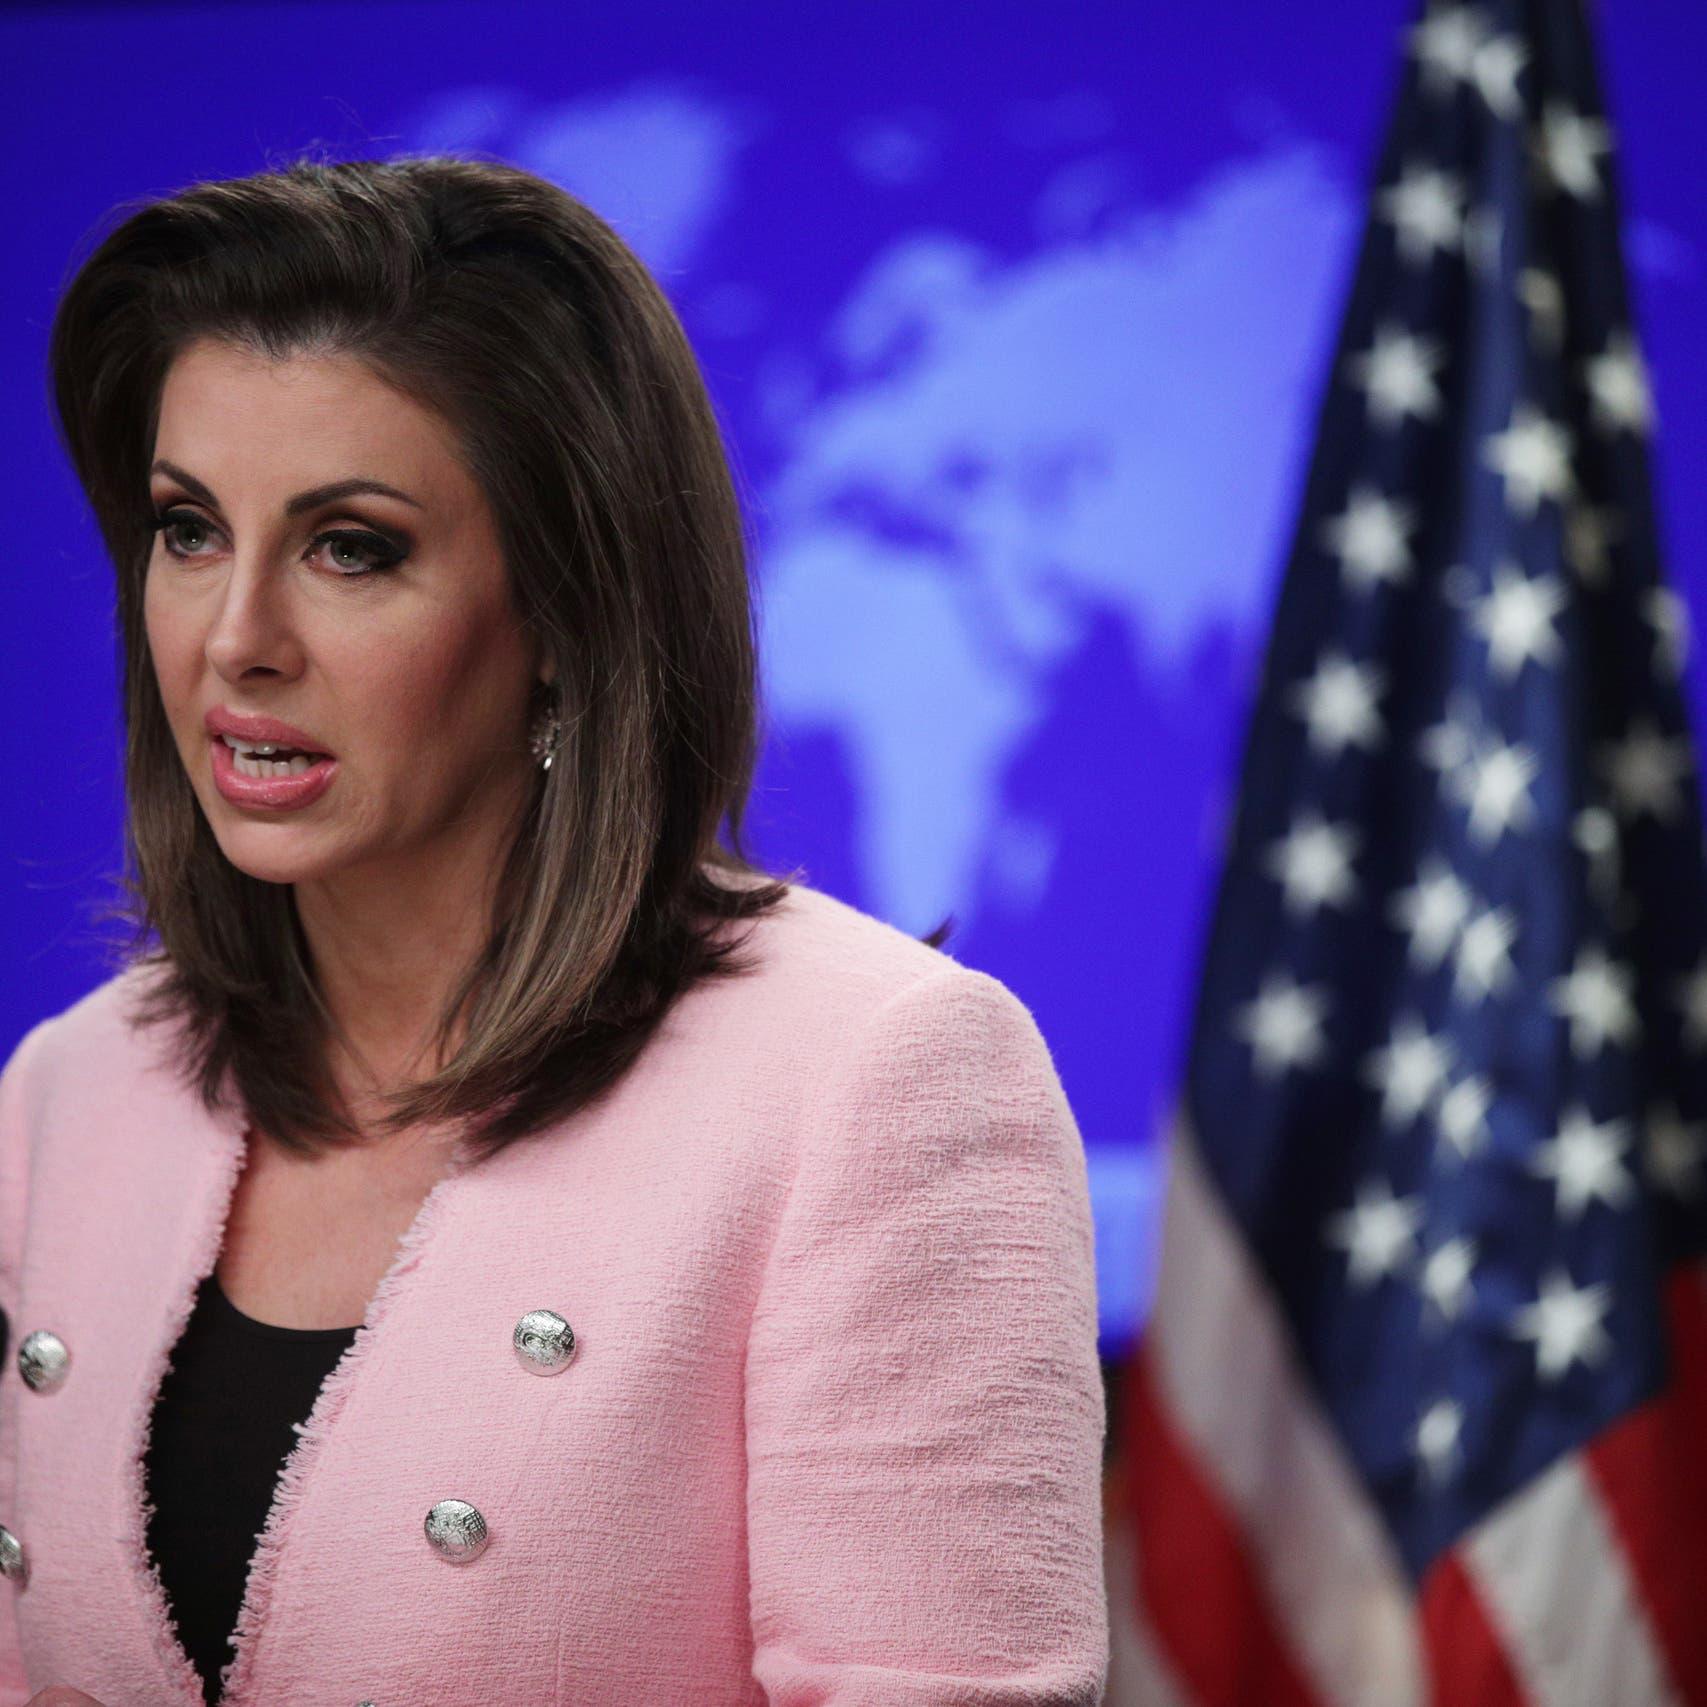 واشنطن تدعو للإفراج عن صحافي أميركي مفقود بسوريا